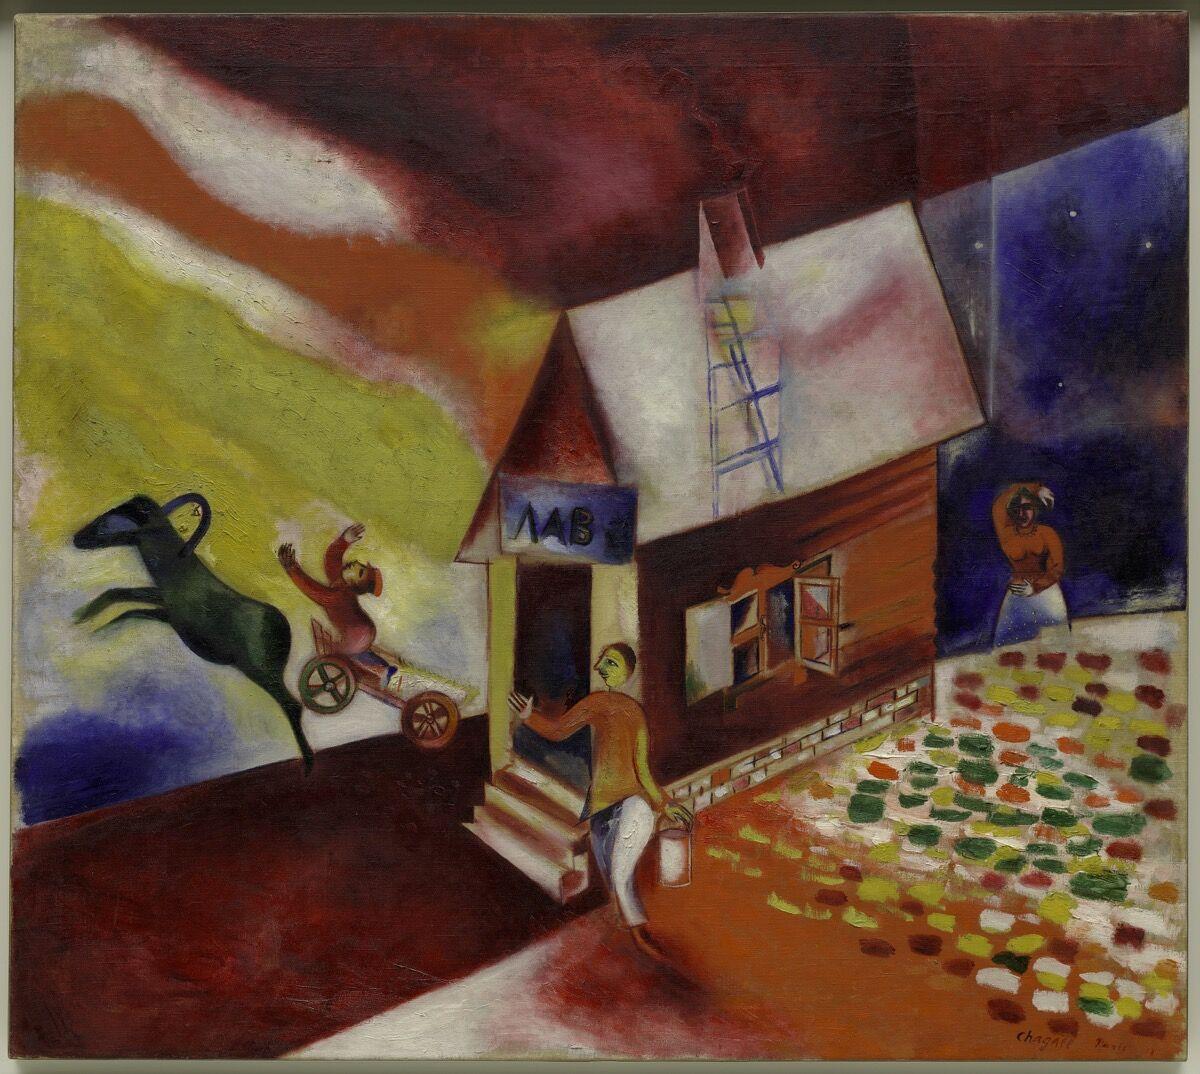 Marc Chagall, The Flying Carriage (La calèche volante), 1913.© Marc Chagall, Vegap, Bilbao 2018. Courtesy of the Guggenheim Bilbao.